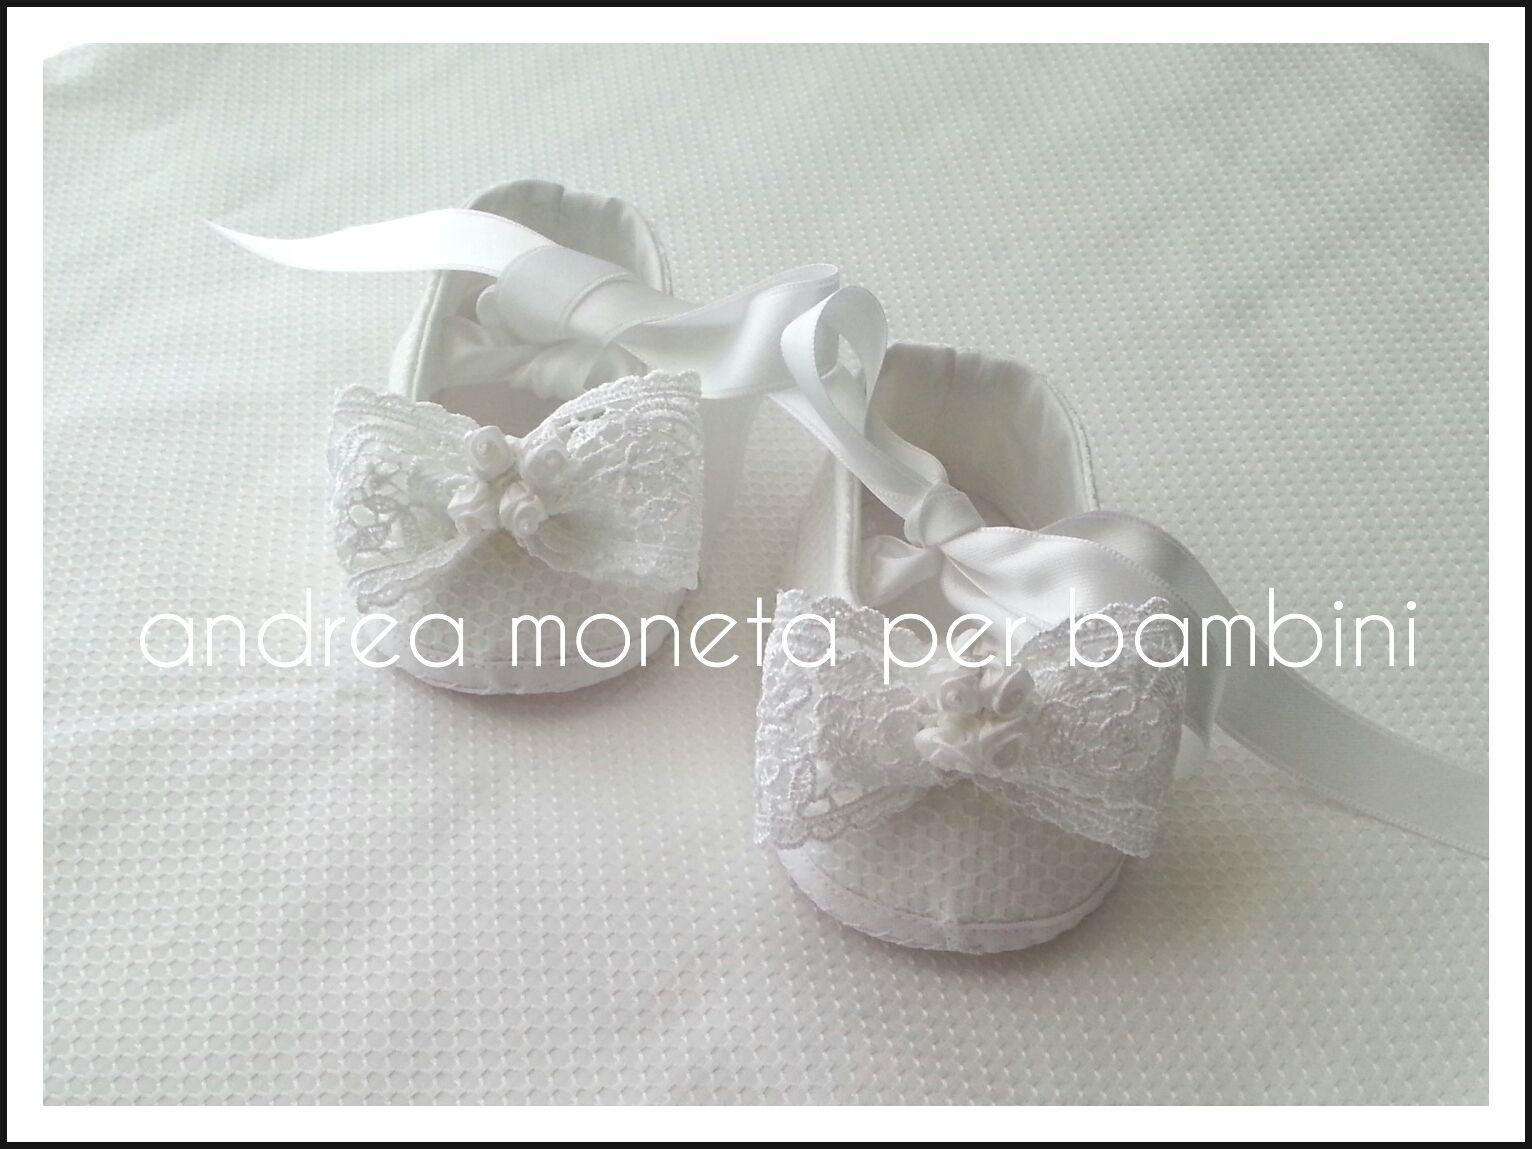 http://www.vestidotienda.com/accesorios.html whatsapp 005491157477550 Venta y Entrega Internacional / Global Sales and Shipping www.andreamoneta.wix.com/perbambini